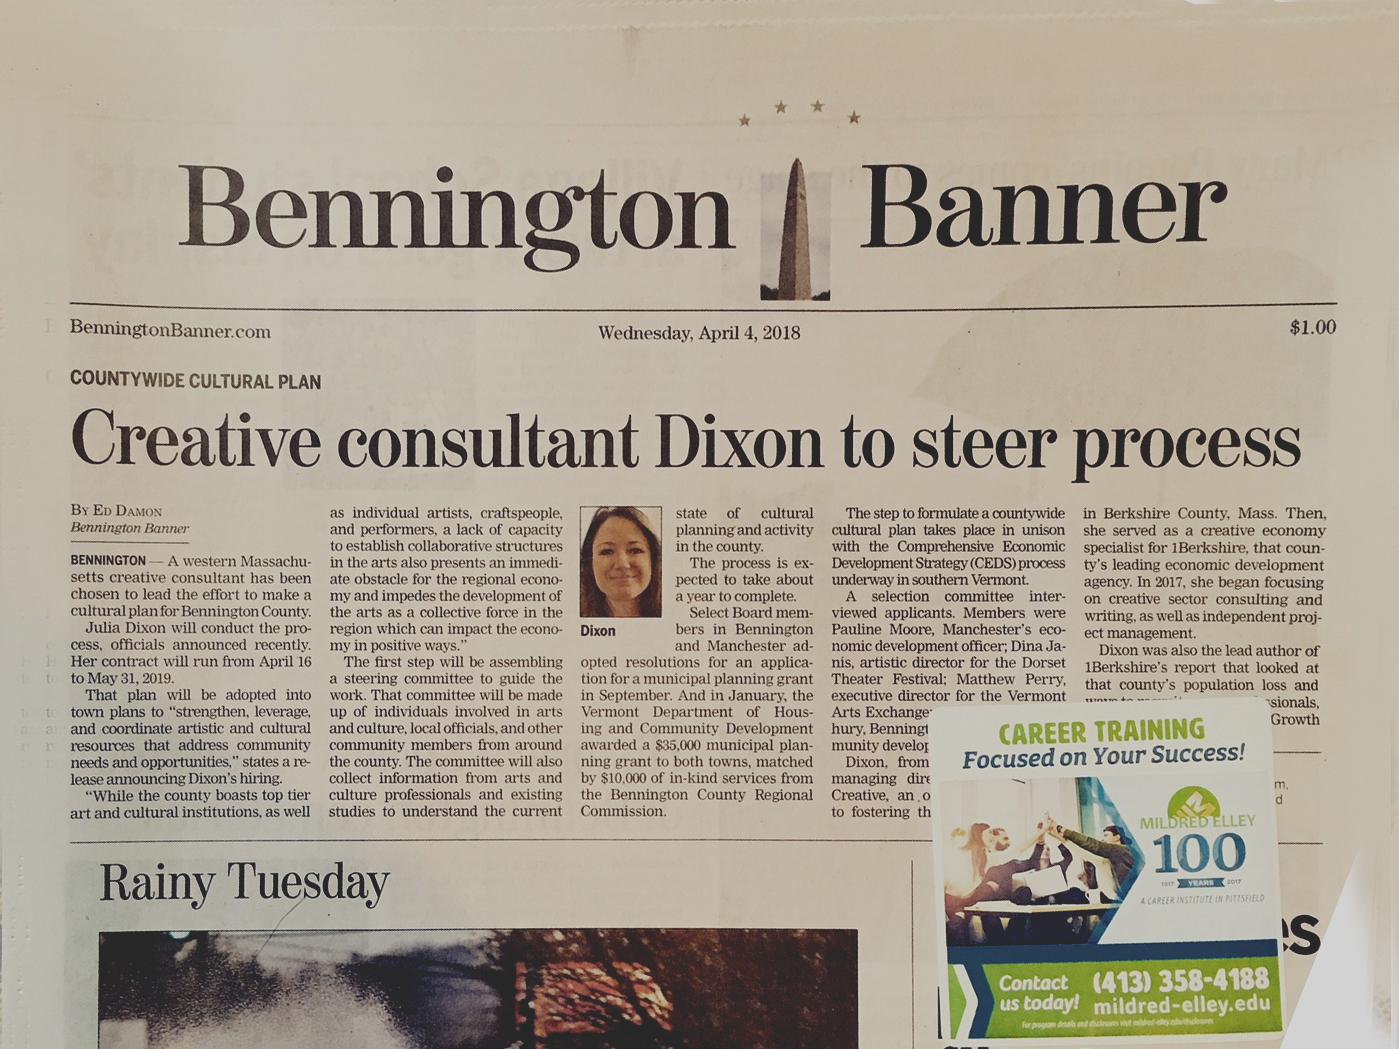 BENNINGTON BANNER - Dixon selected to create county-wide cultural plan